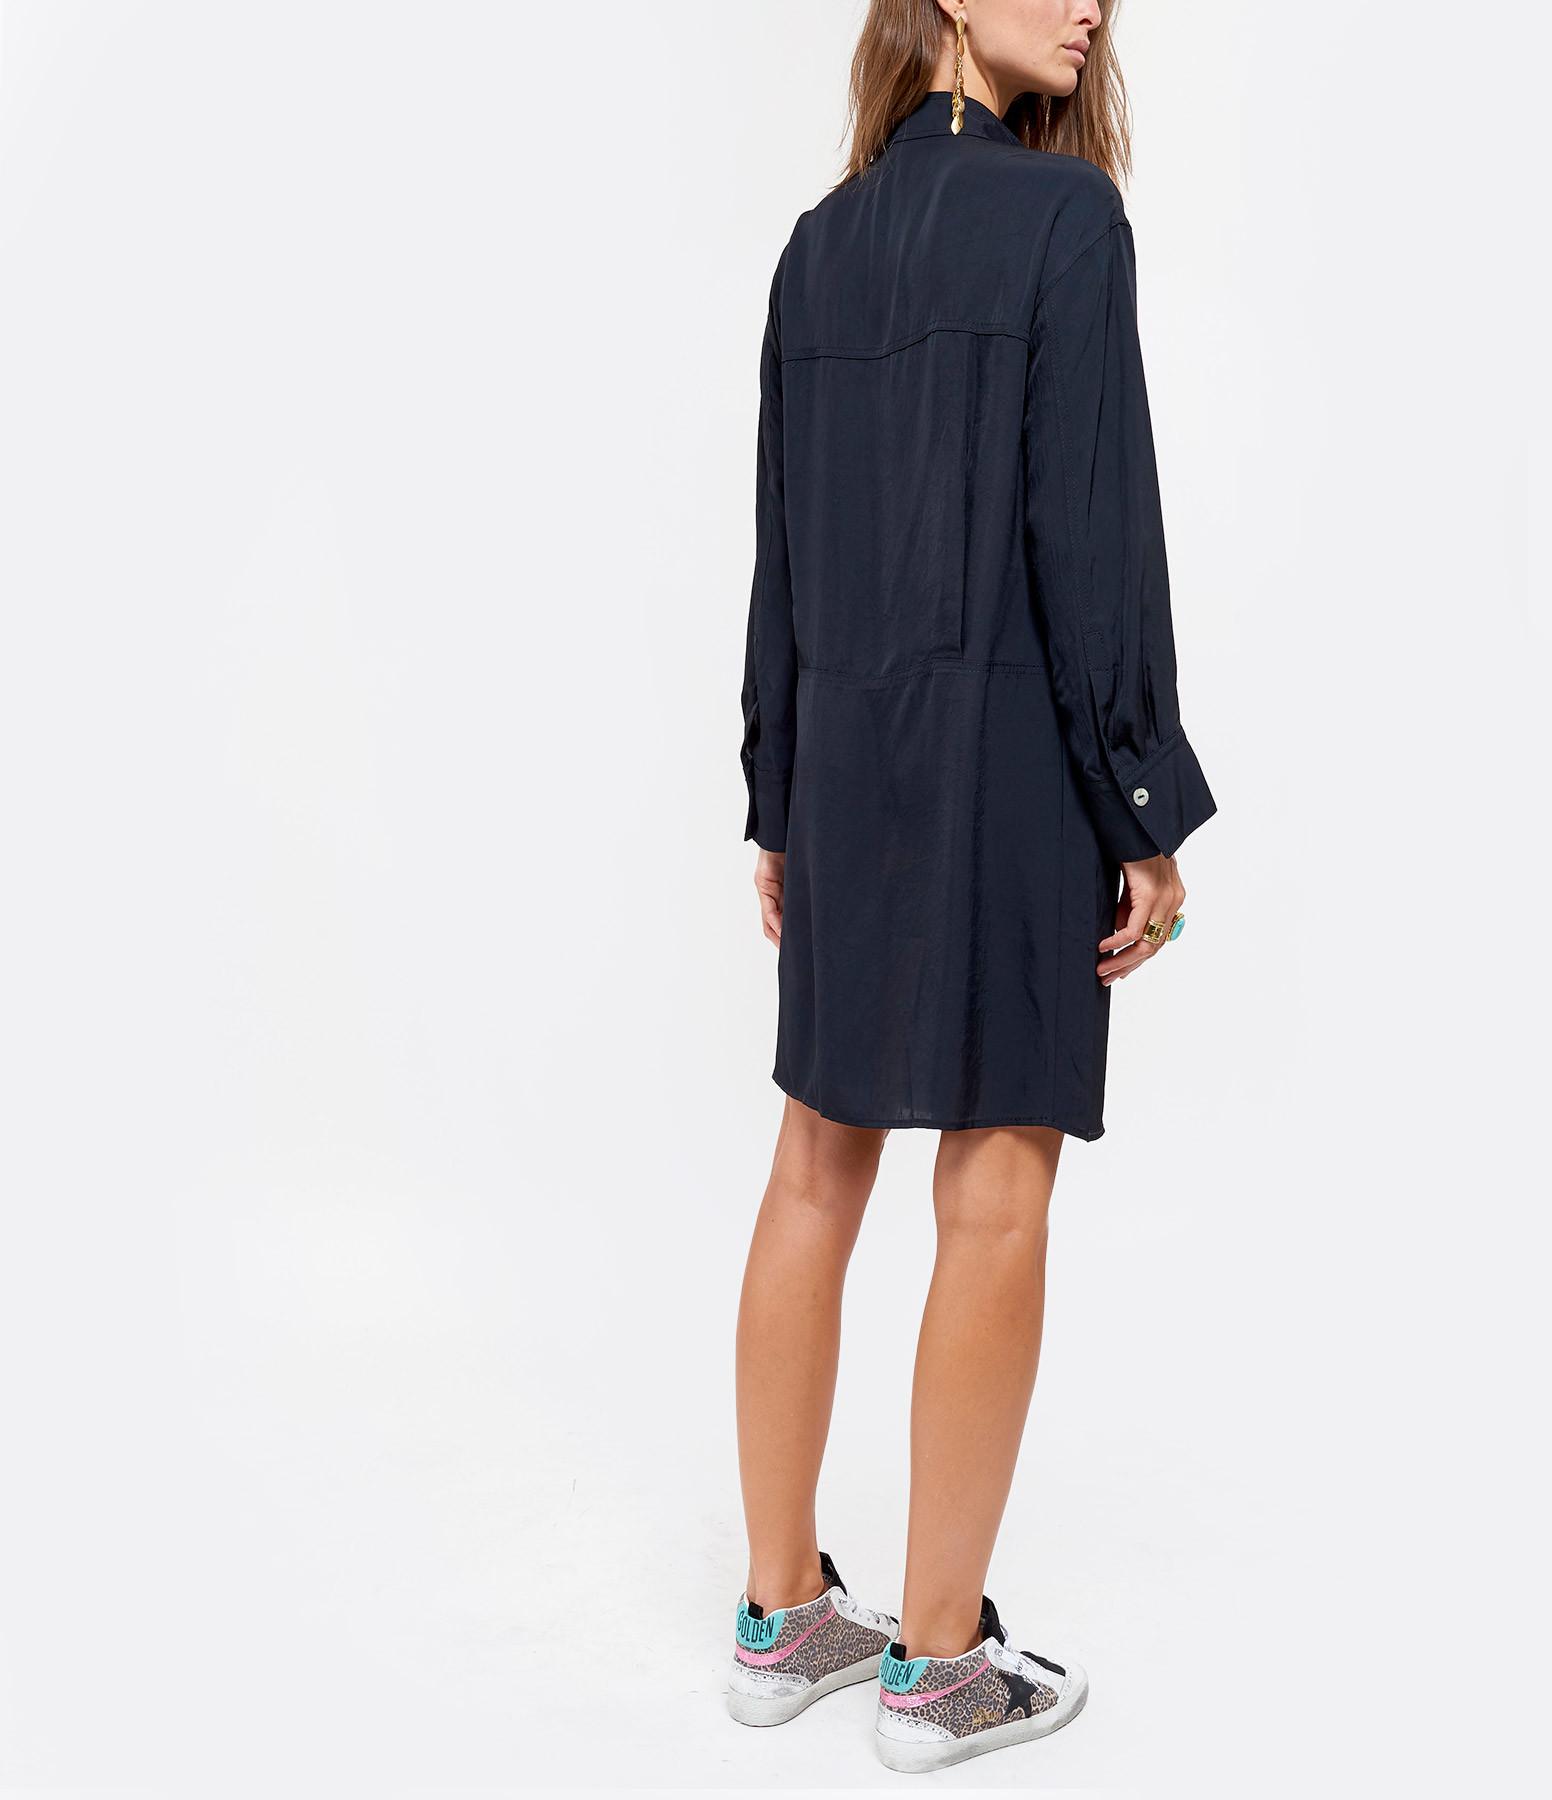 VINCE - Robe Noir